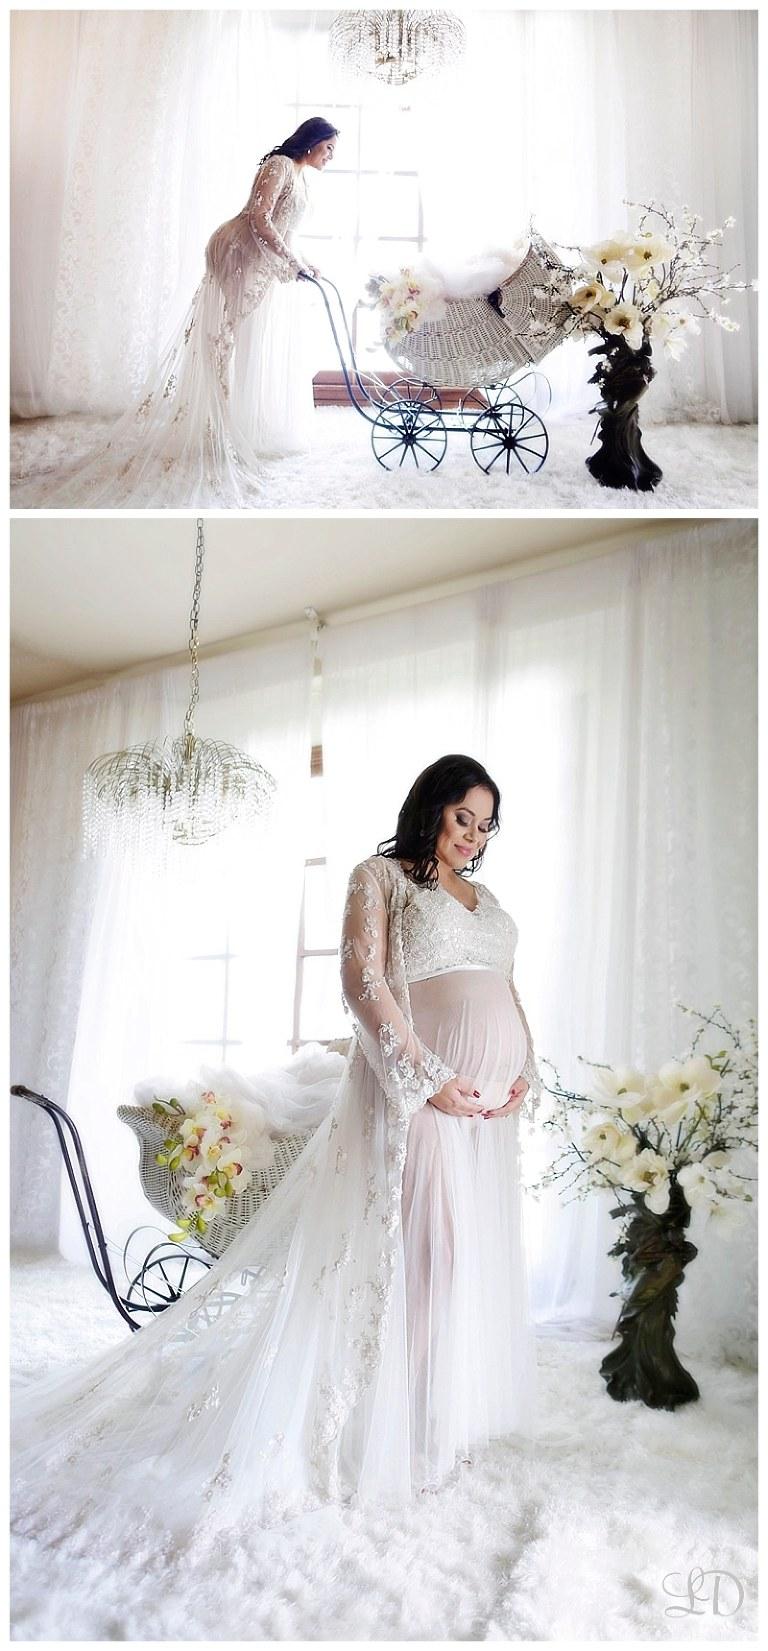 sweet maternity photoshoot-lori dorman photography-maternity boudoir-professional photographer_2988.jpg